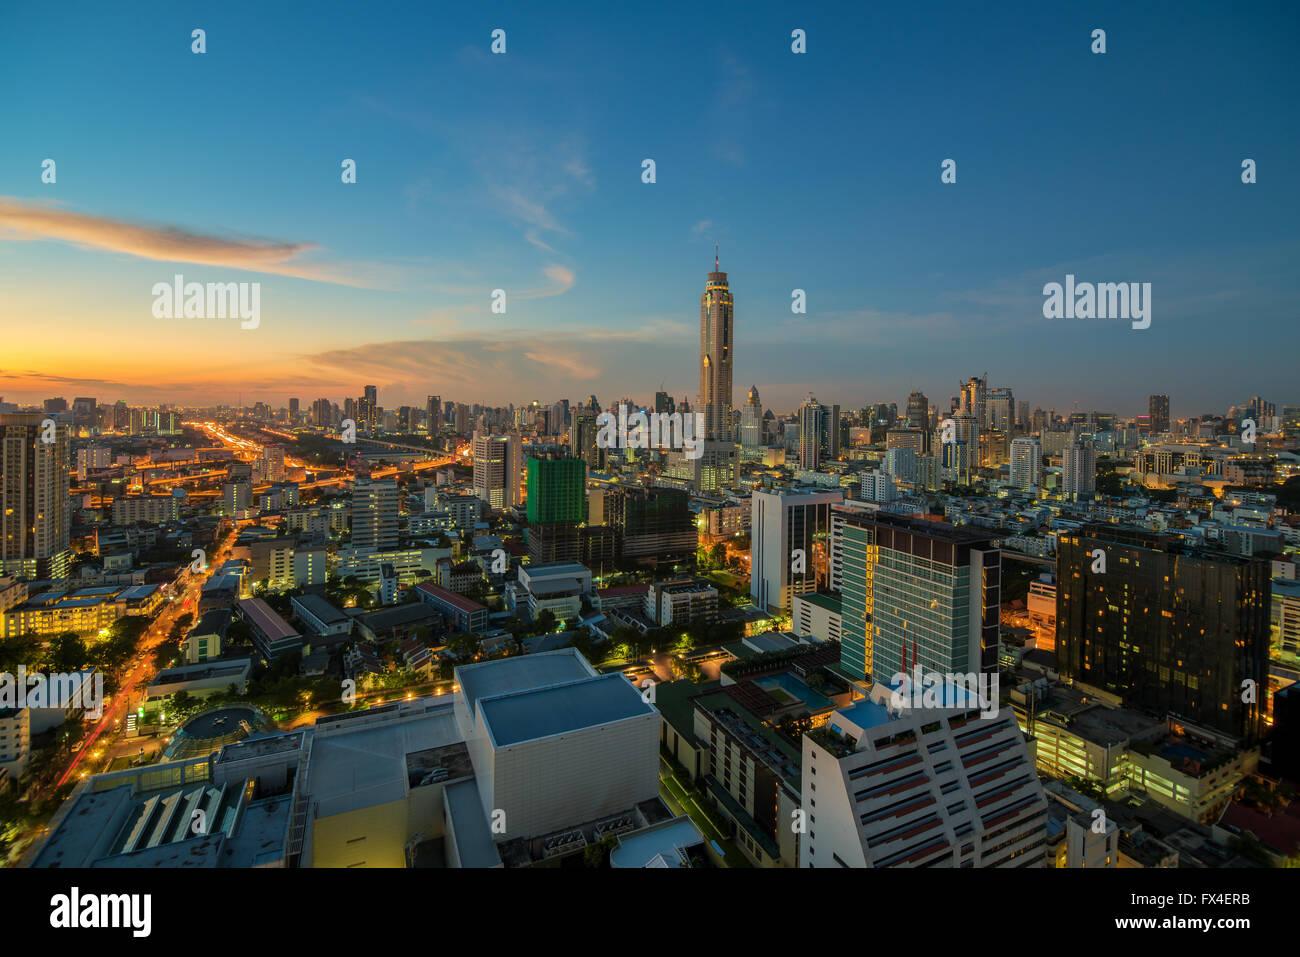 Bangkok City night view con bel cielo Immagini Stock